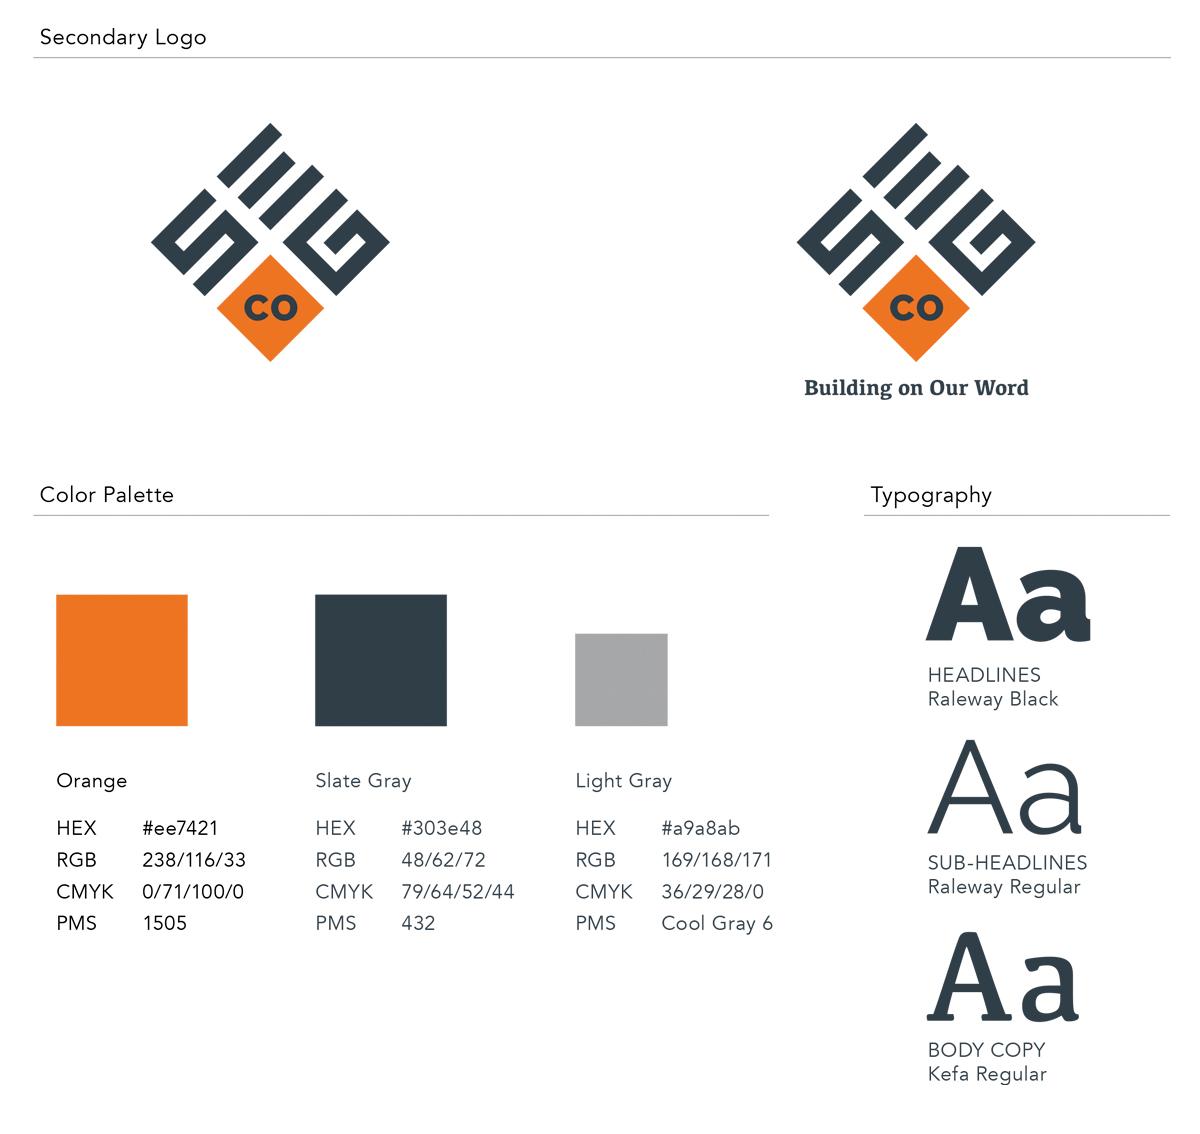 SEG Companies Brand Style Guide by Annatto